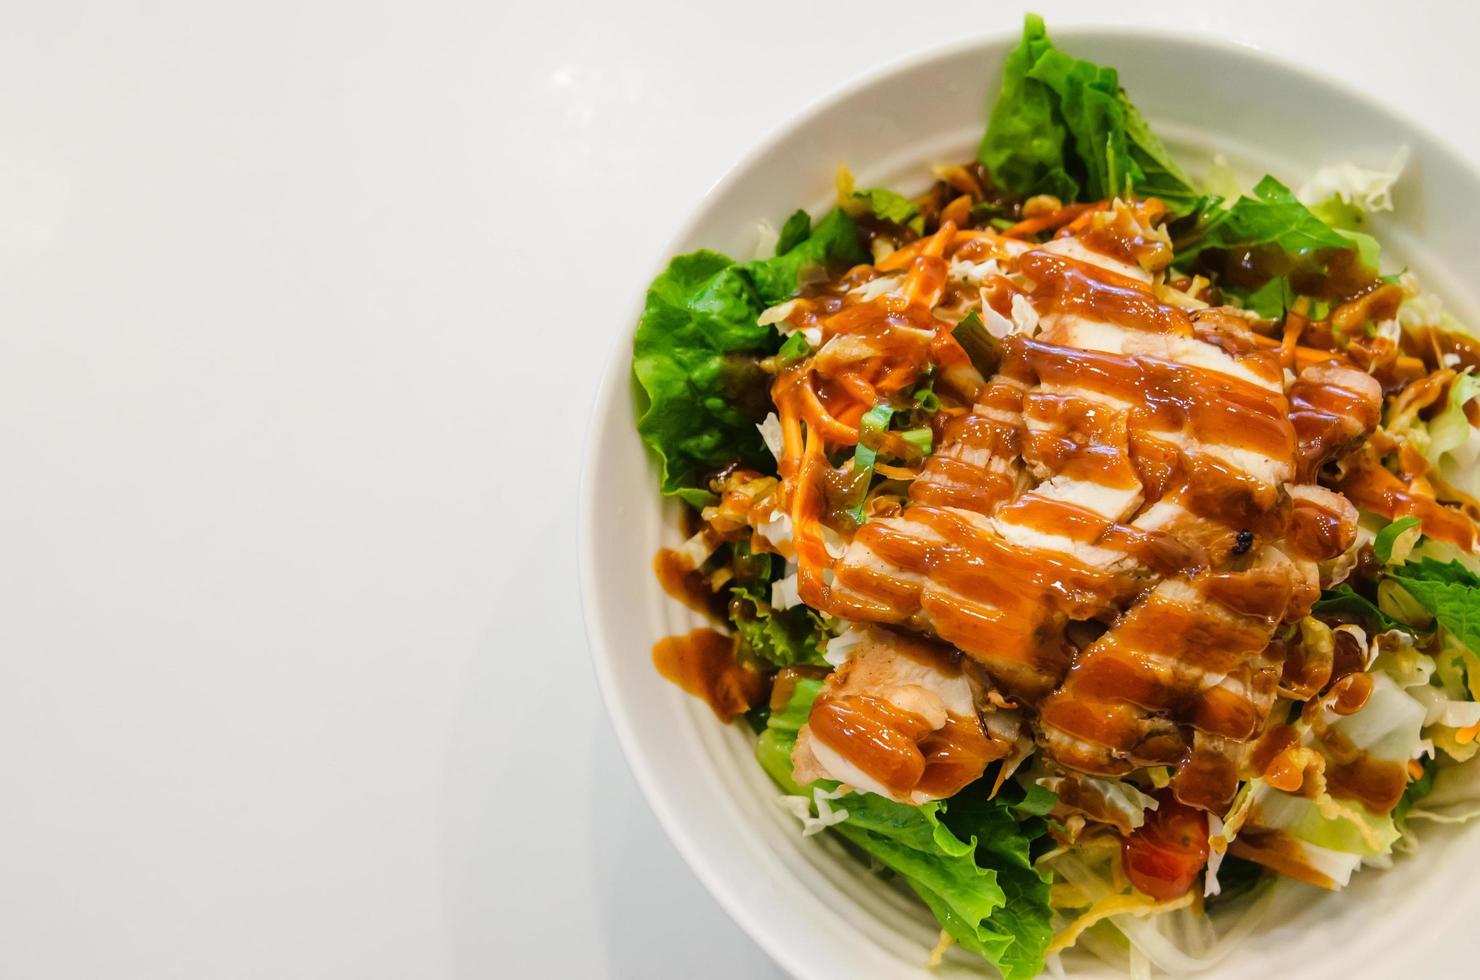 vista superior de ensalada de pollo foto